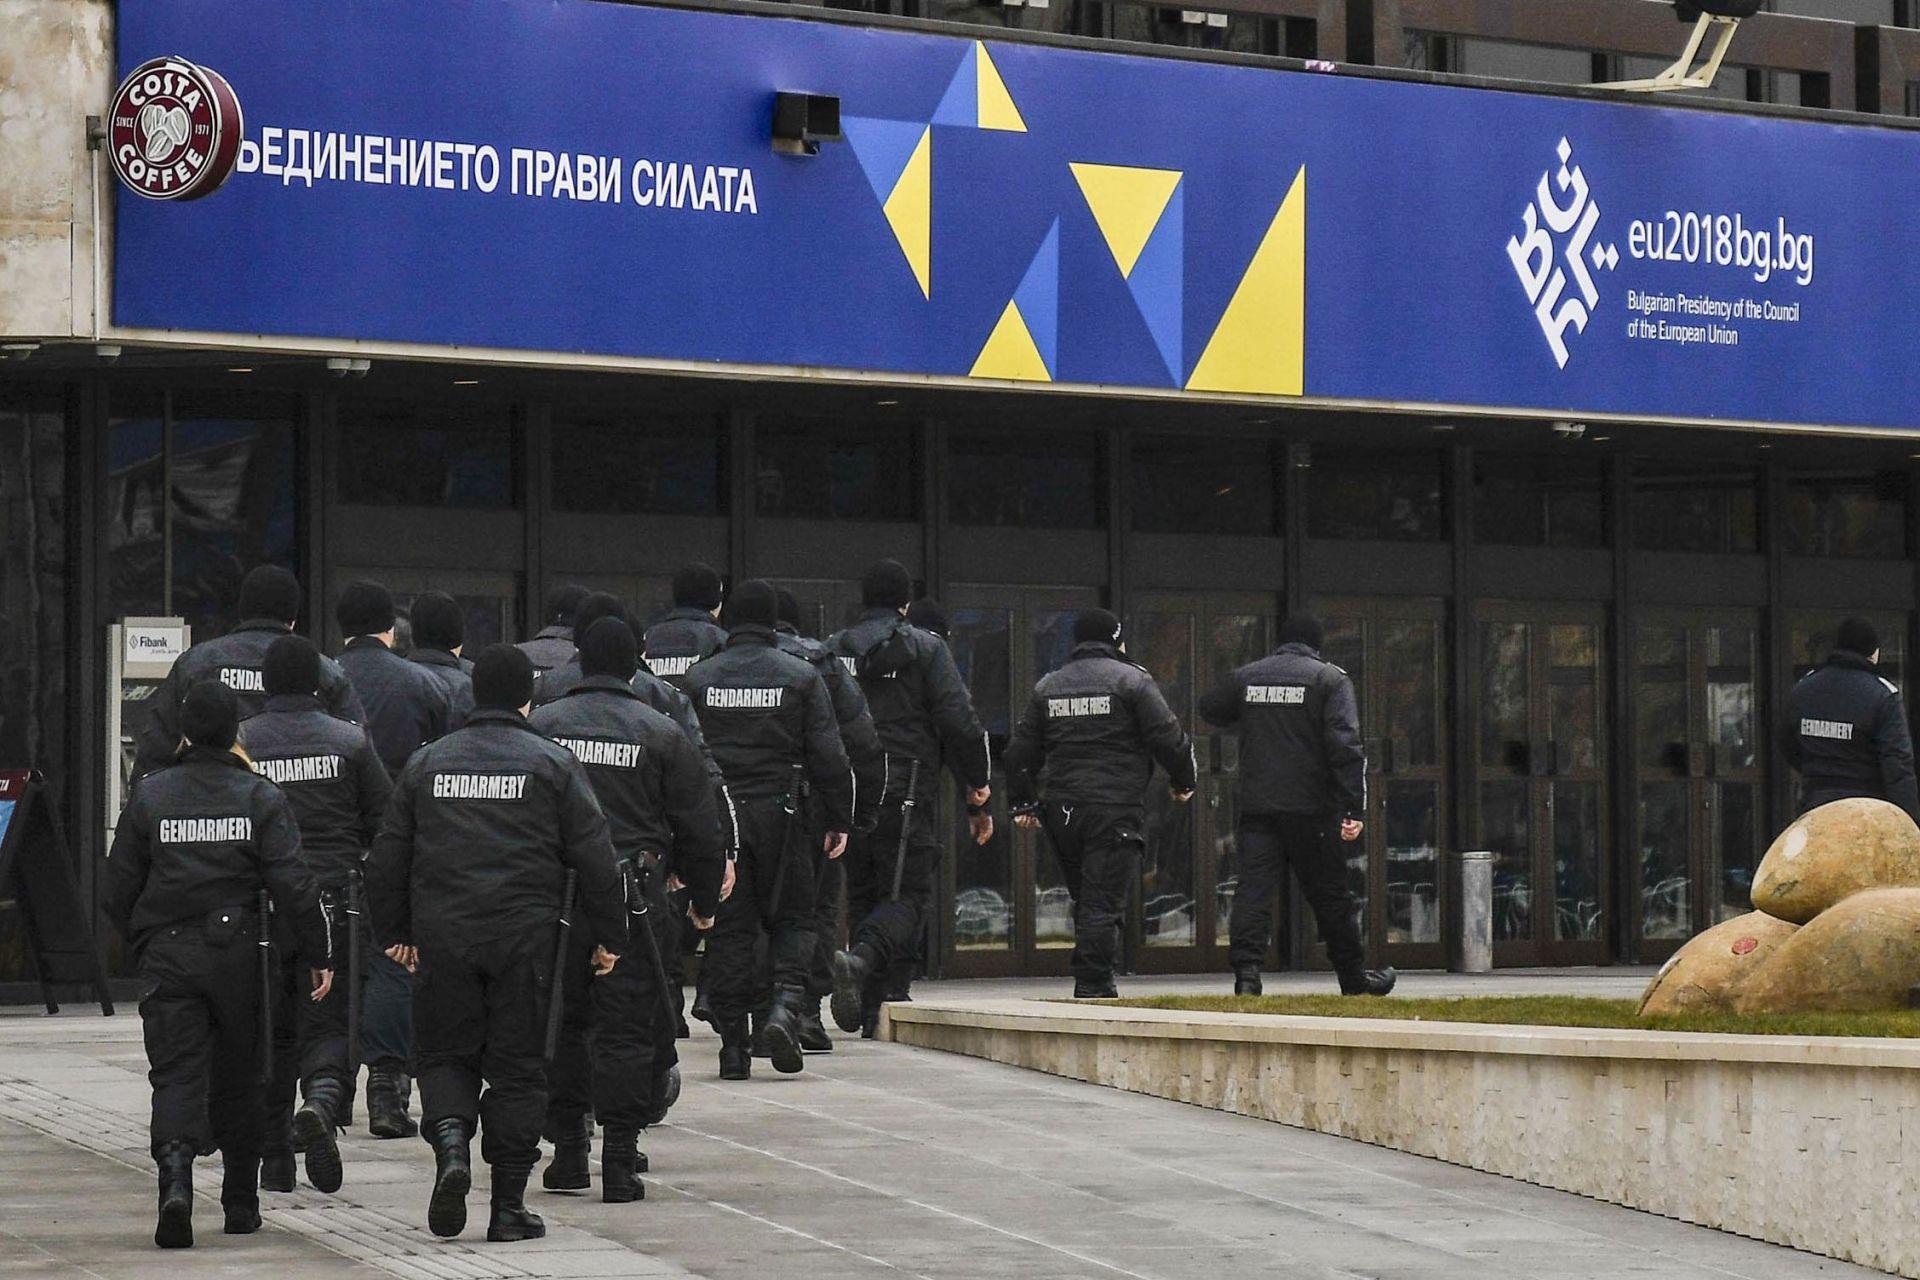 Европредседателството започна при засилени мерки за сигурност в НДК